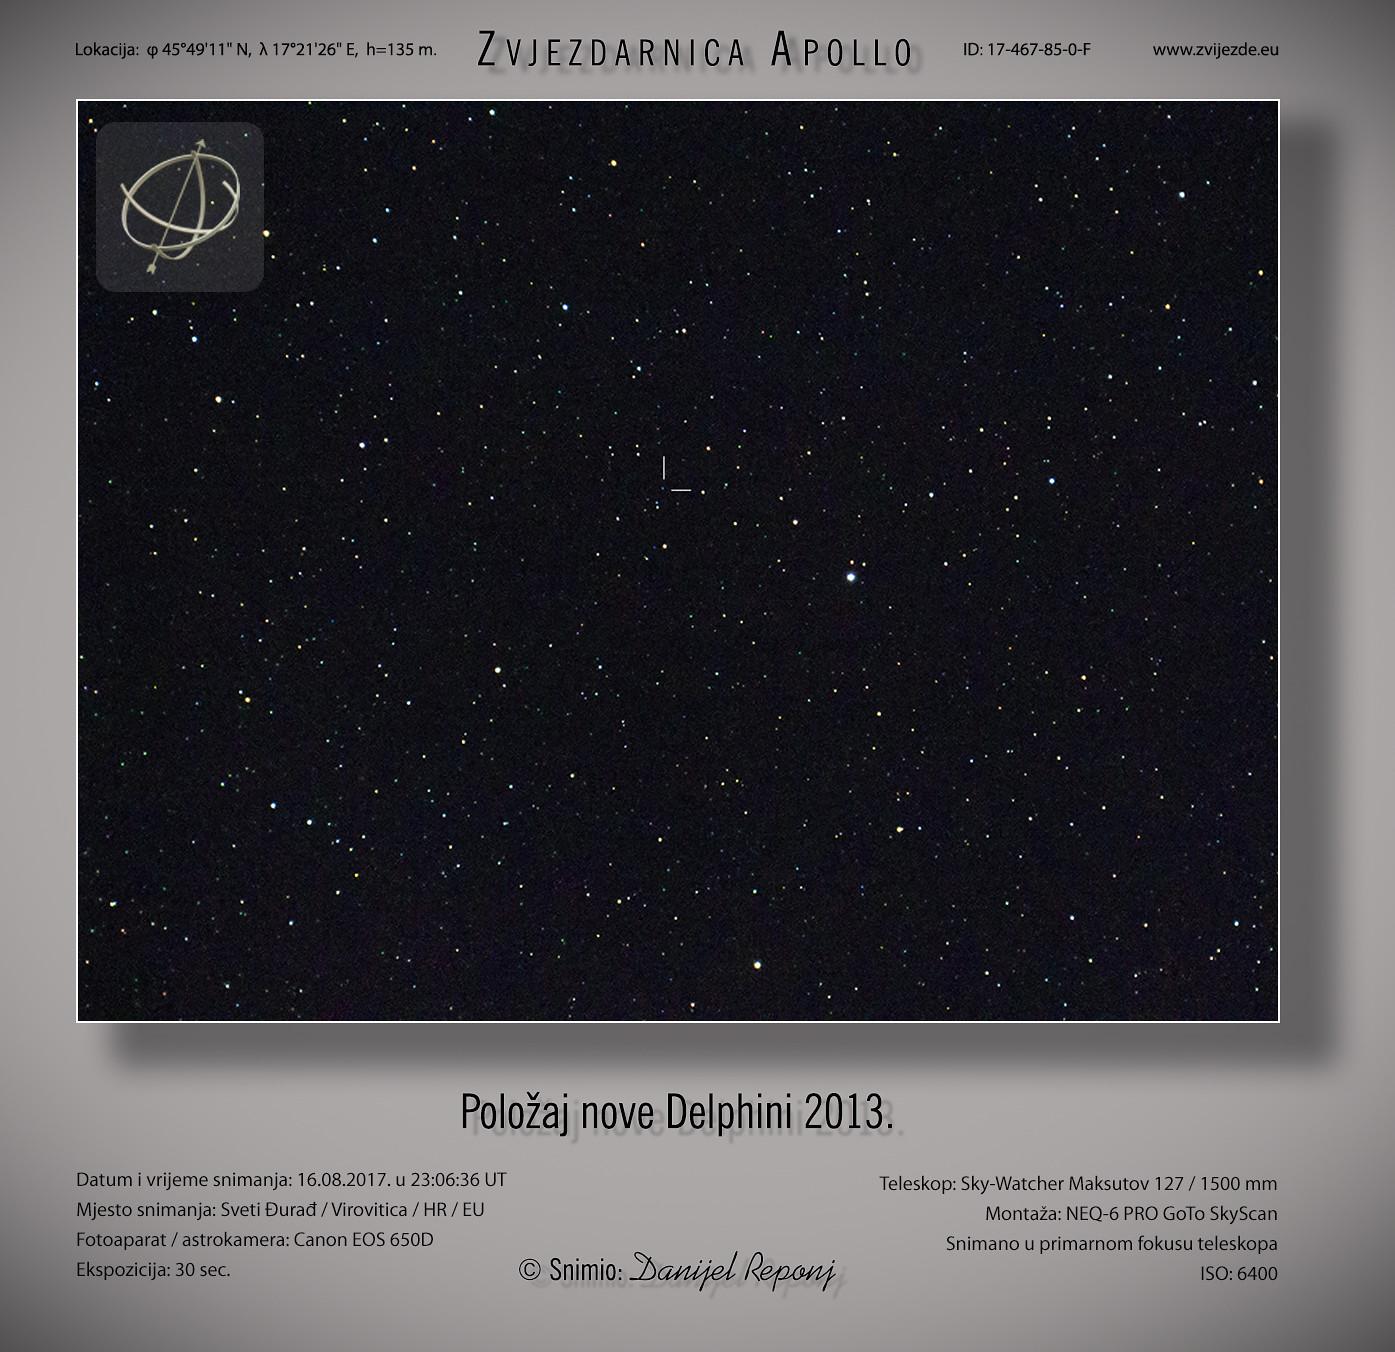 Položaj nove Delphini 2013, 16.8.2017.